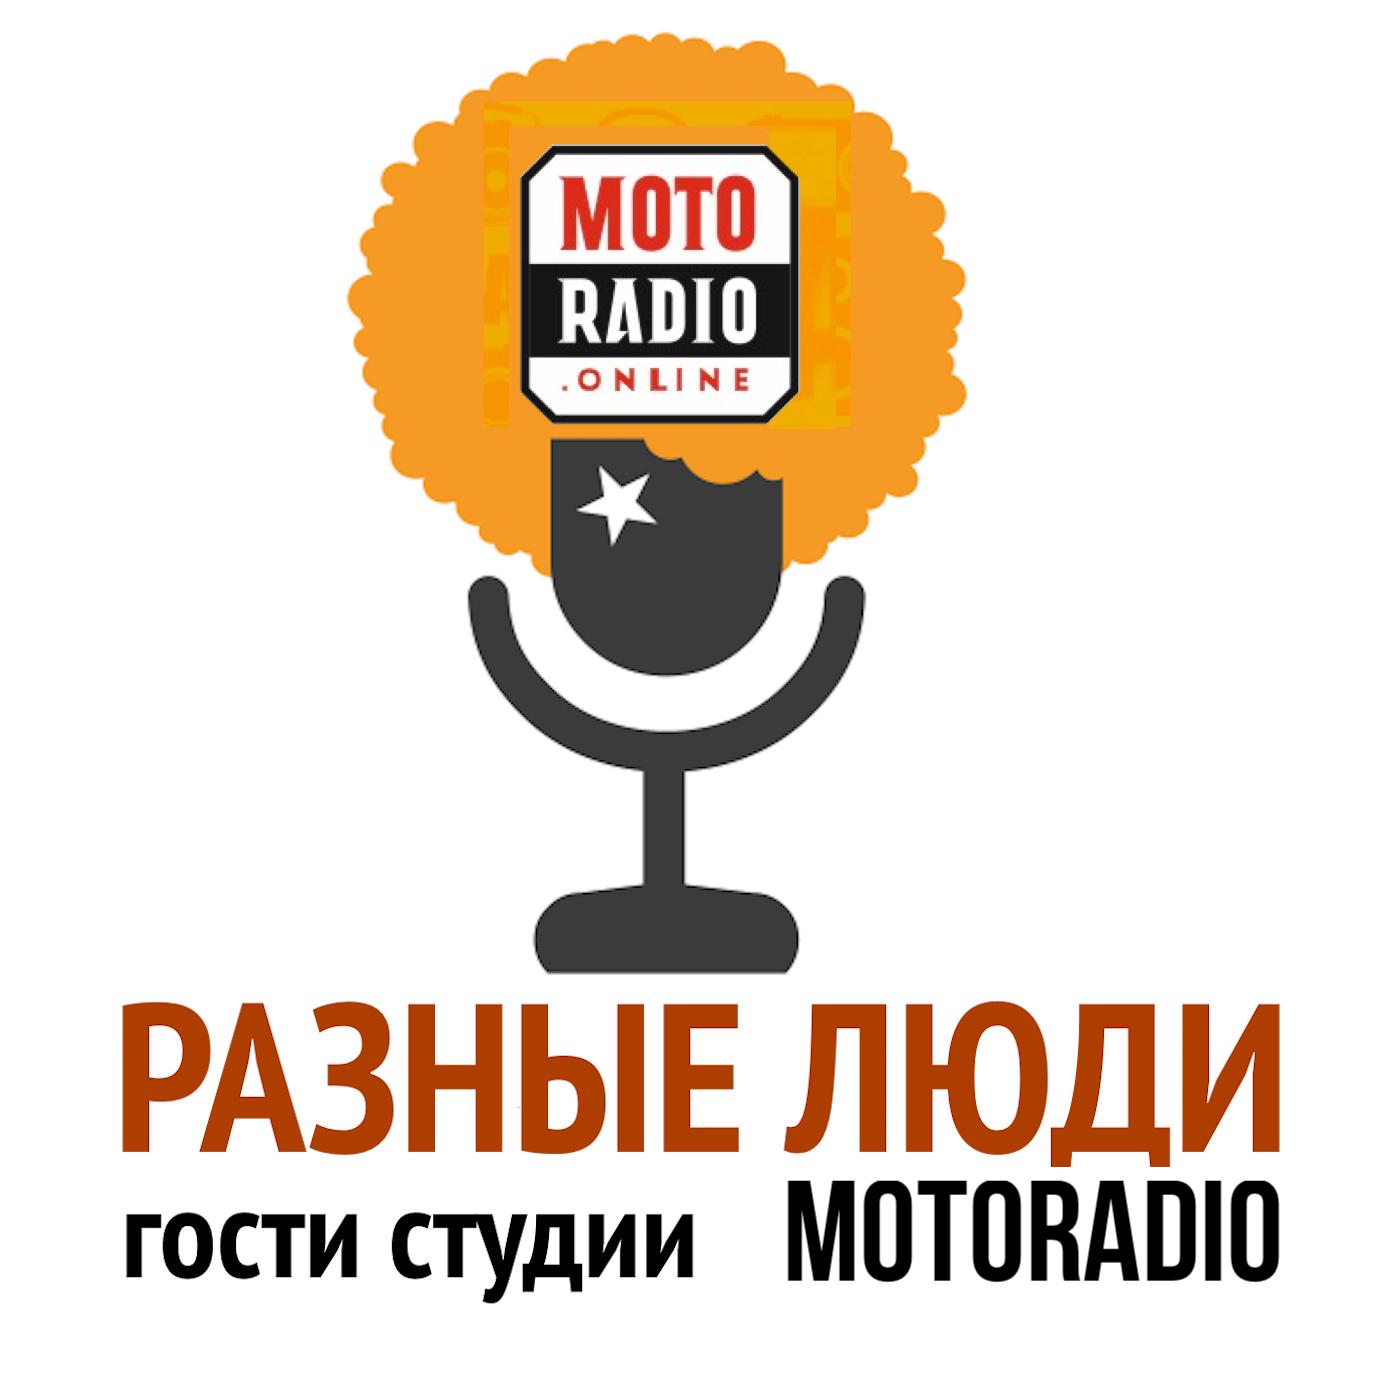 Моторадио Мистер Олимпия Александр Федоров на радио Фонтанка александр радищев вольность